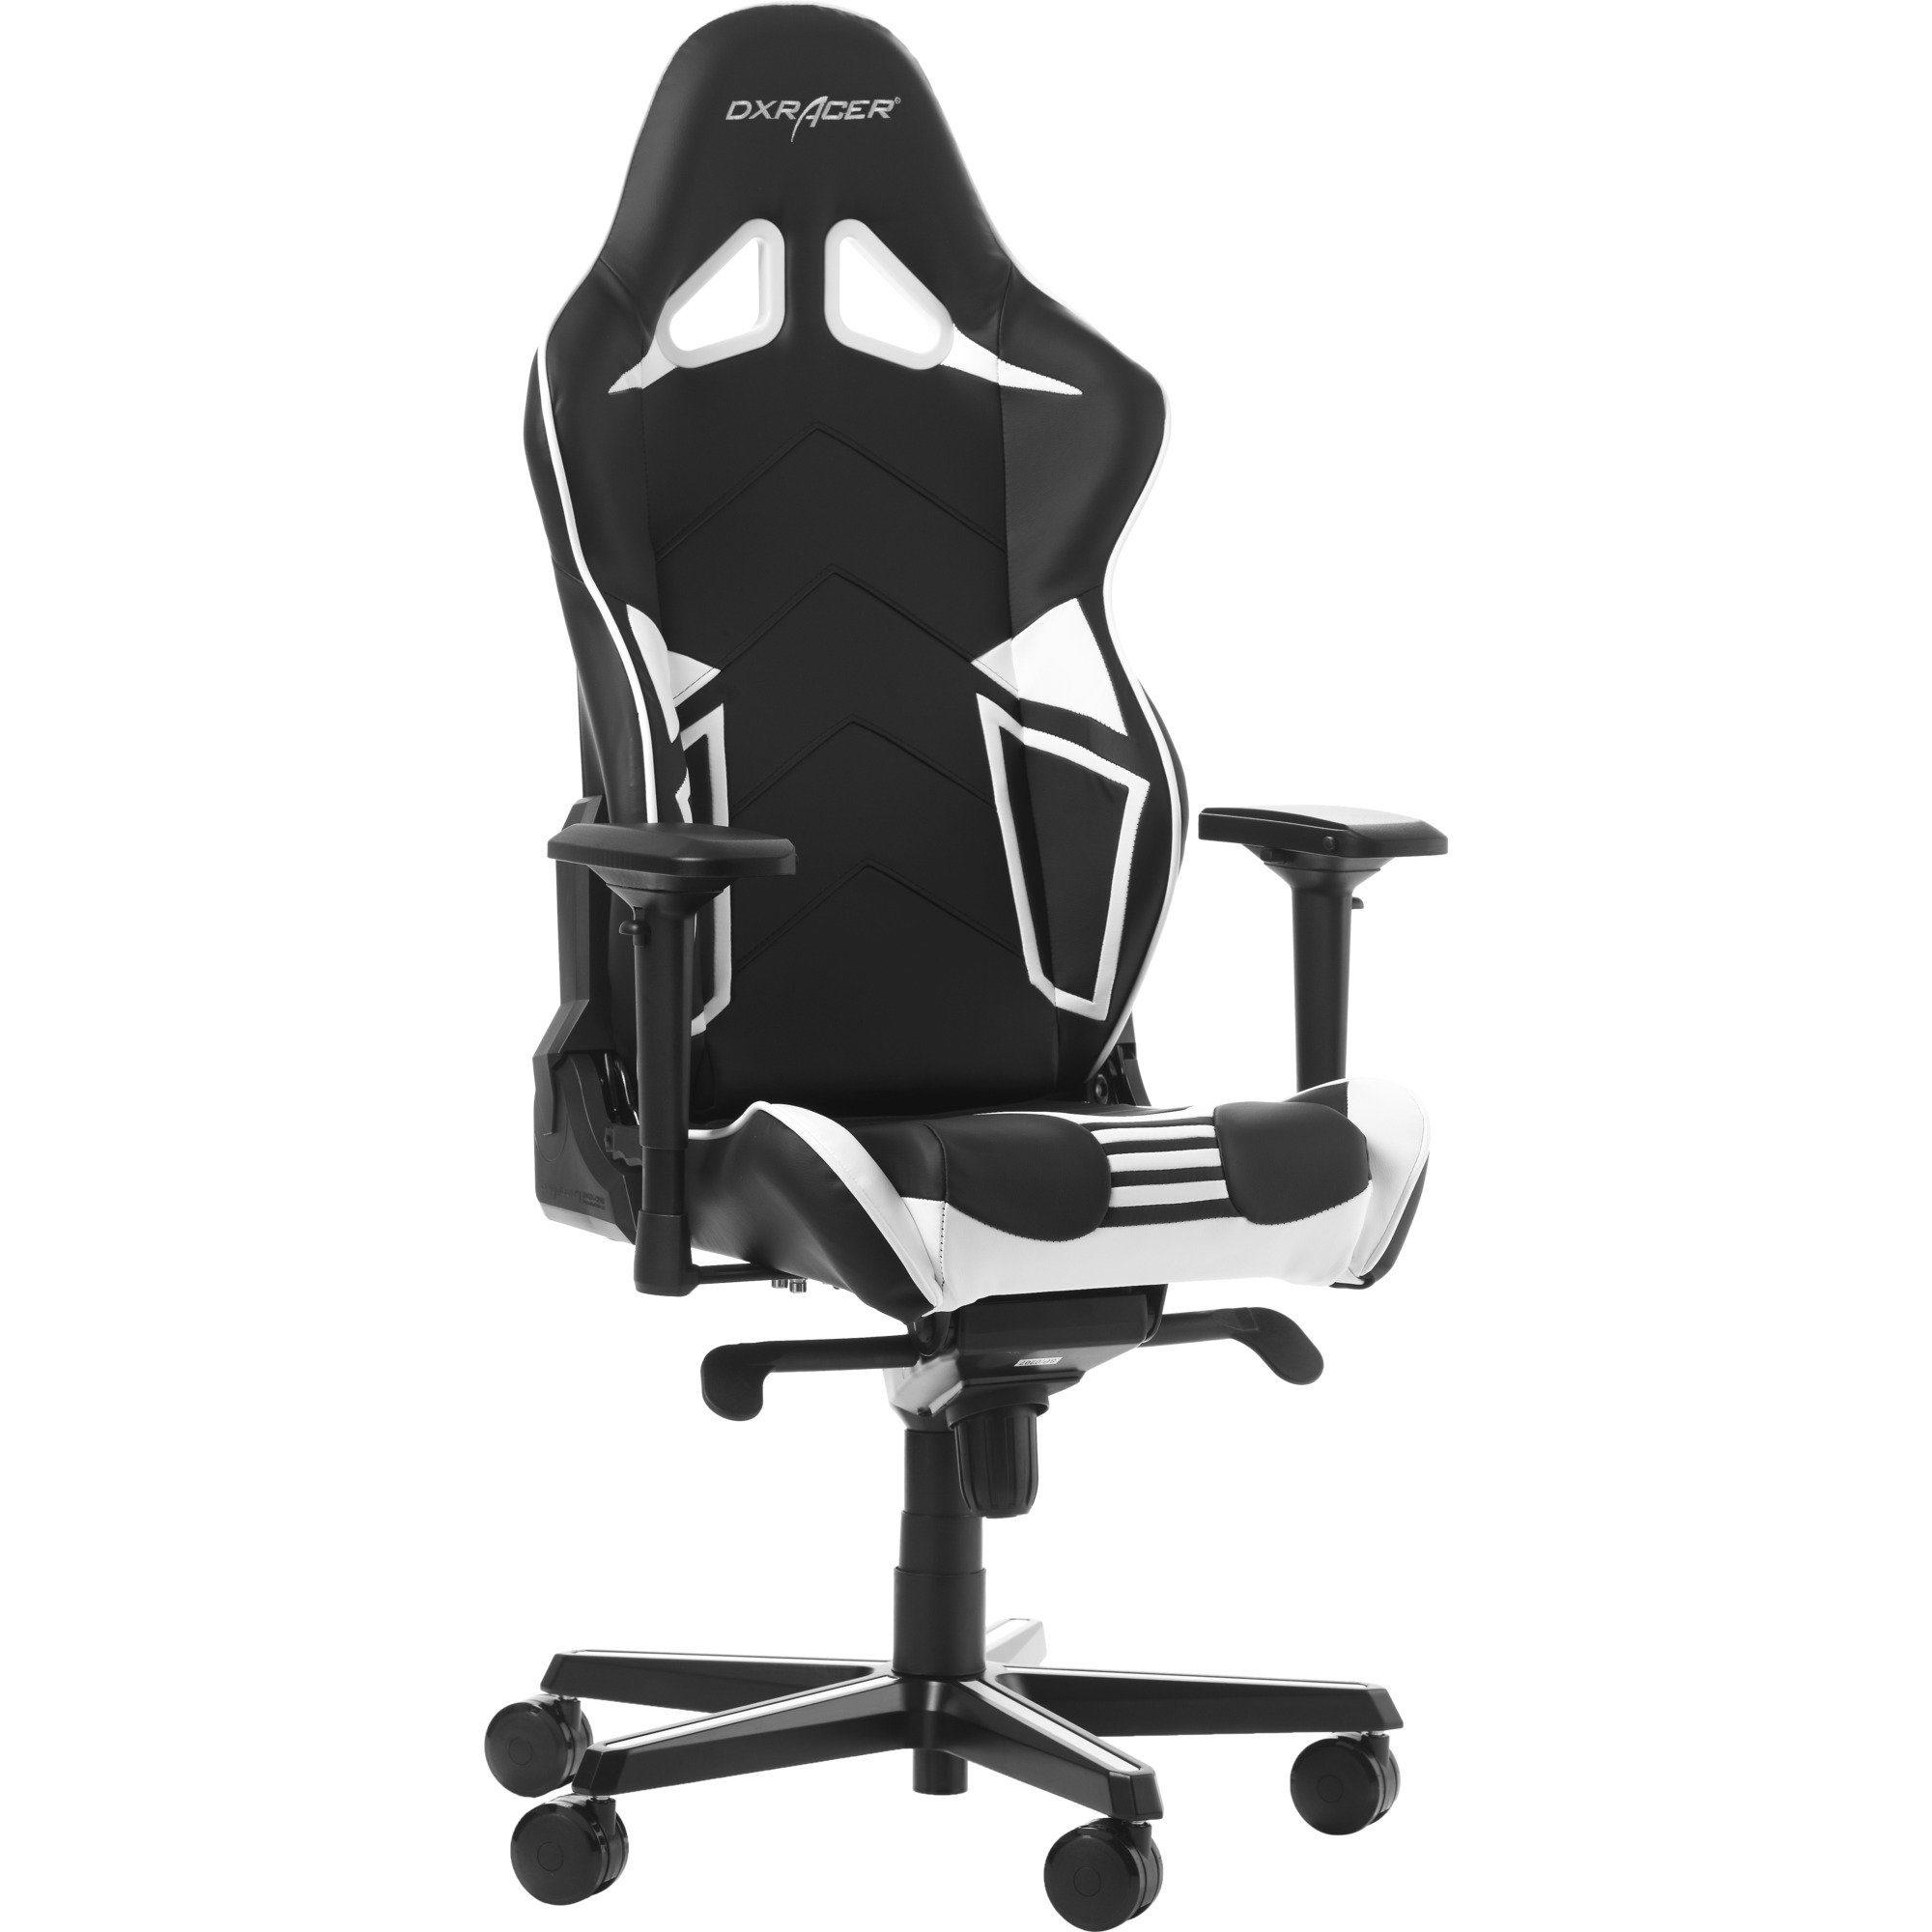 DXRacer Spielsitz »Racing Pro Gaming Chair«